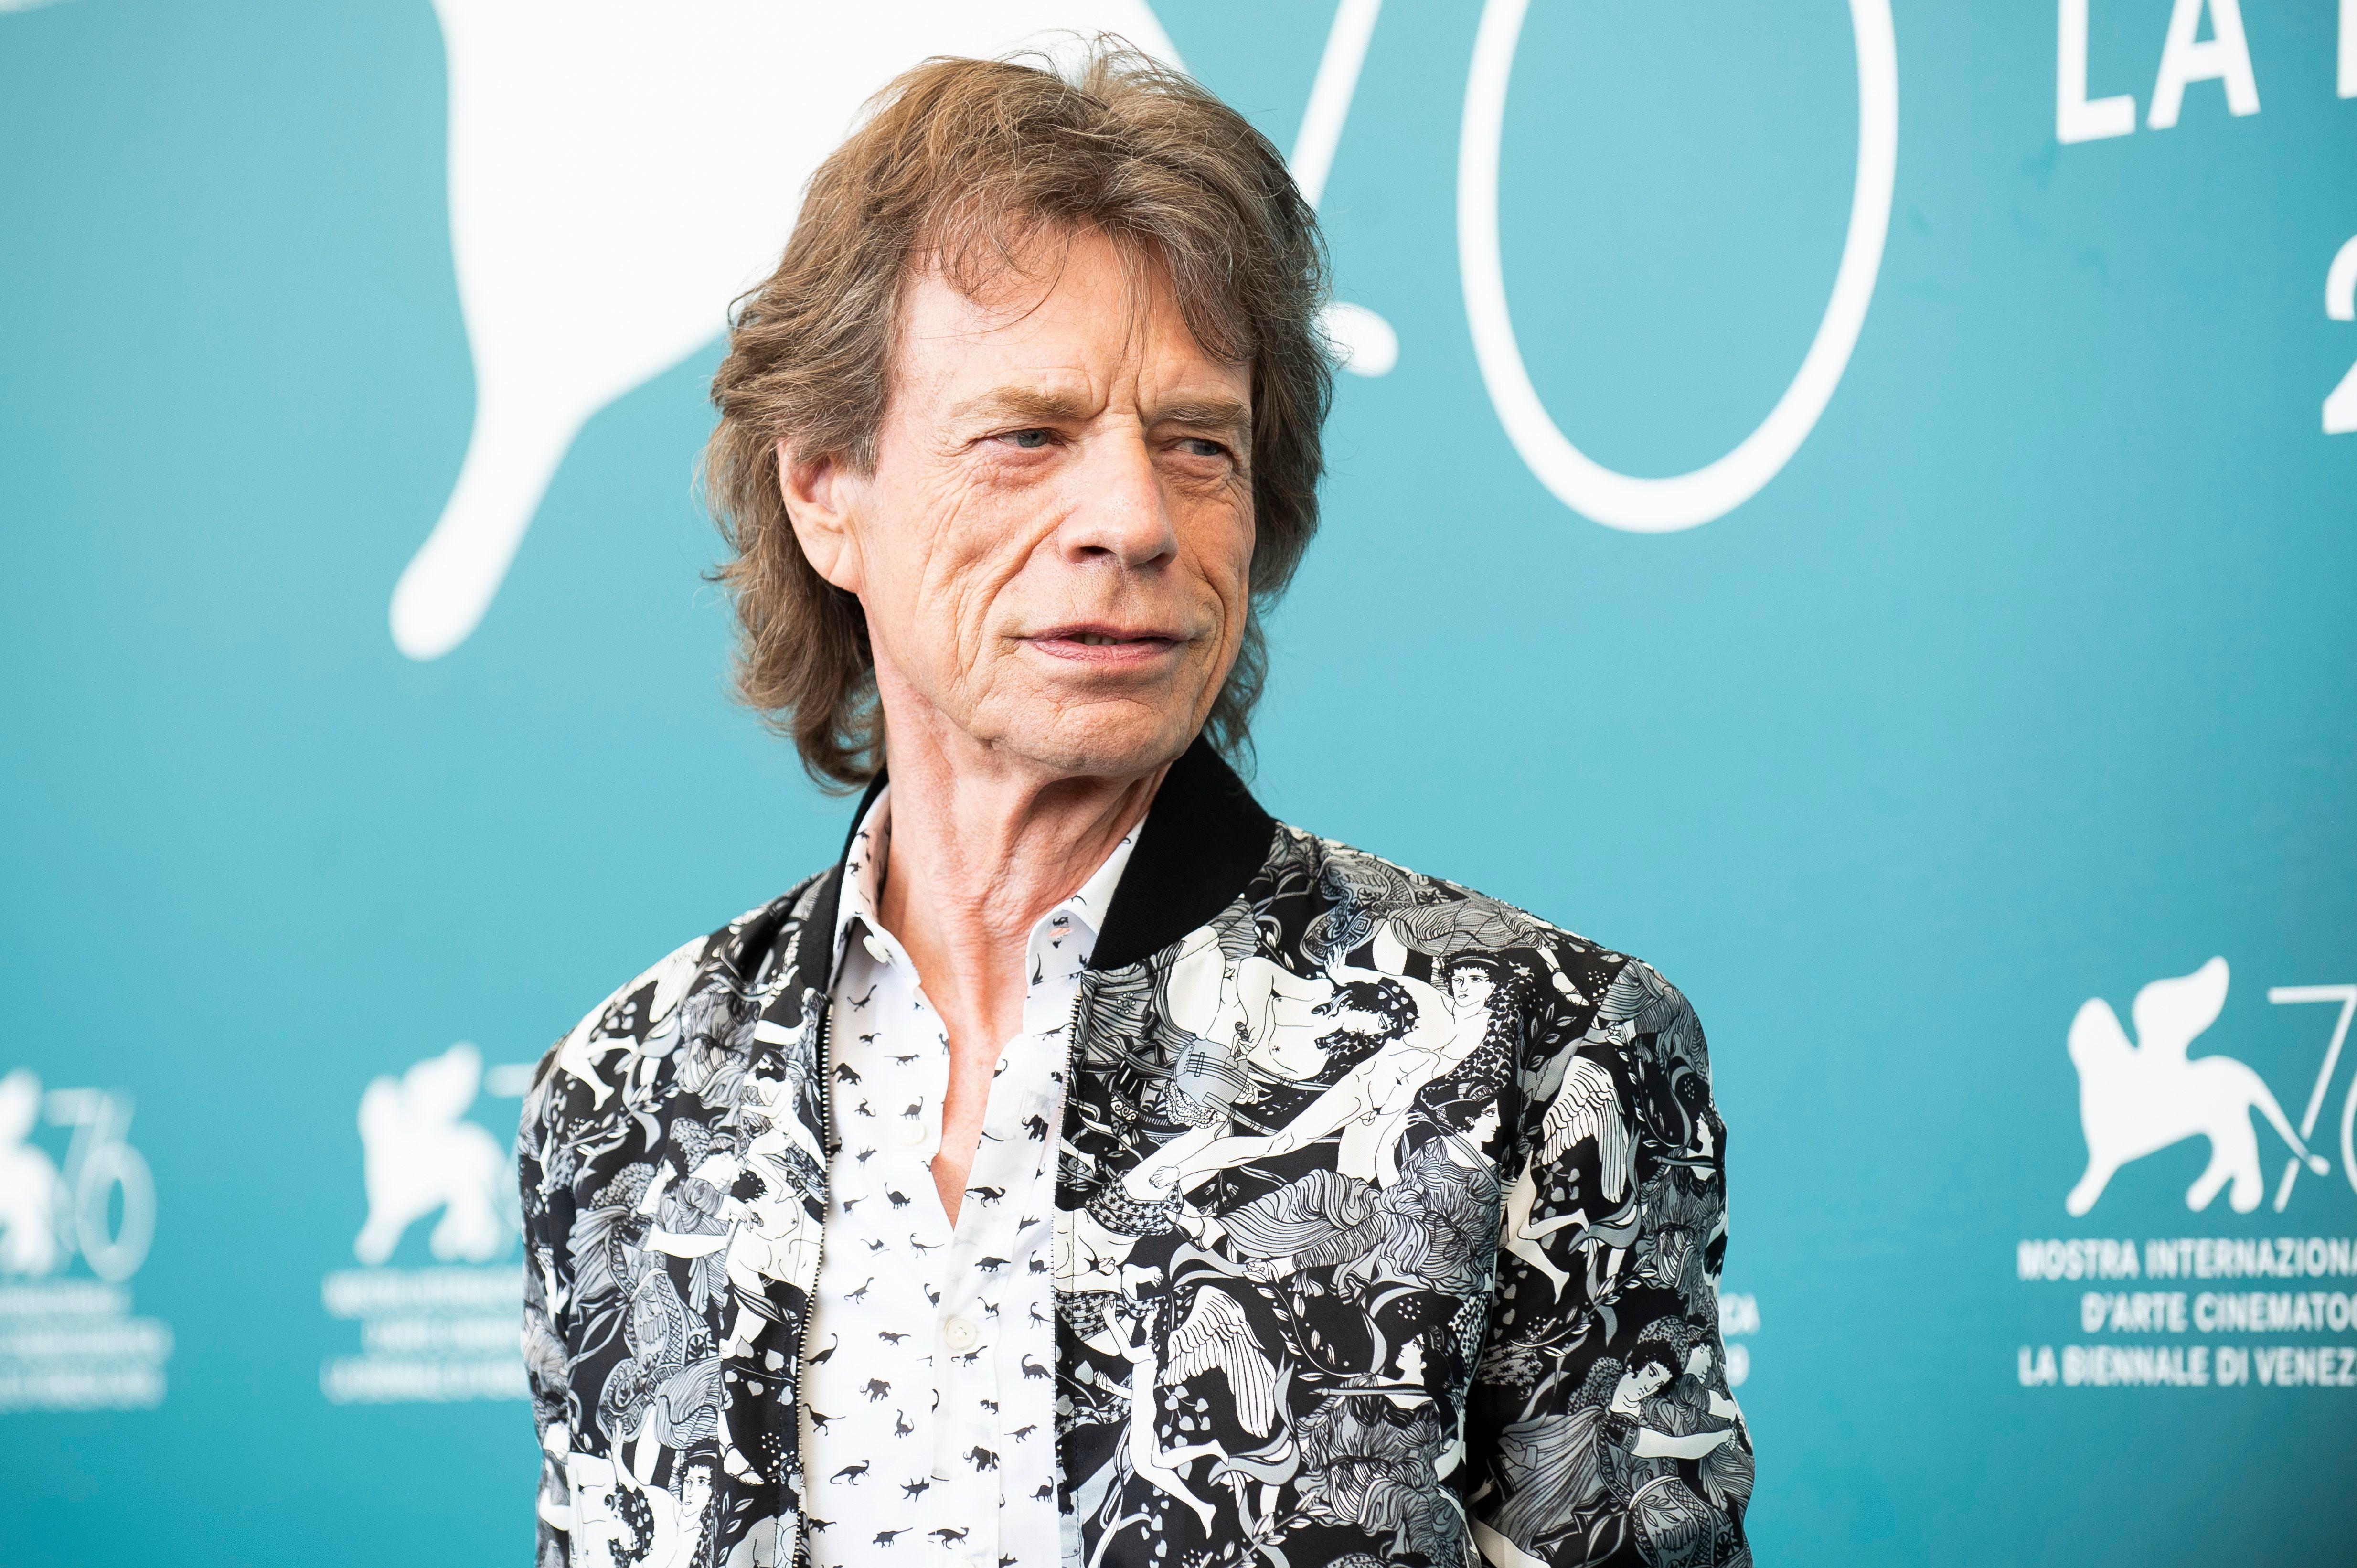 Zerchoo Music - Mick Jagger Condemns Trump Administration's